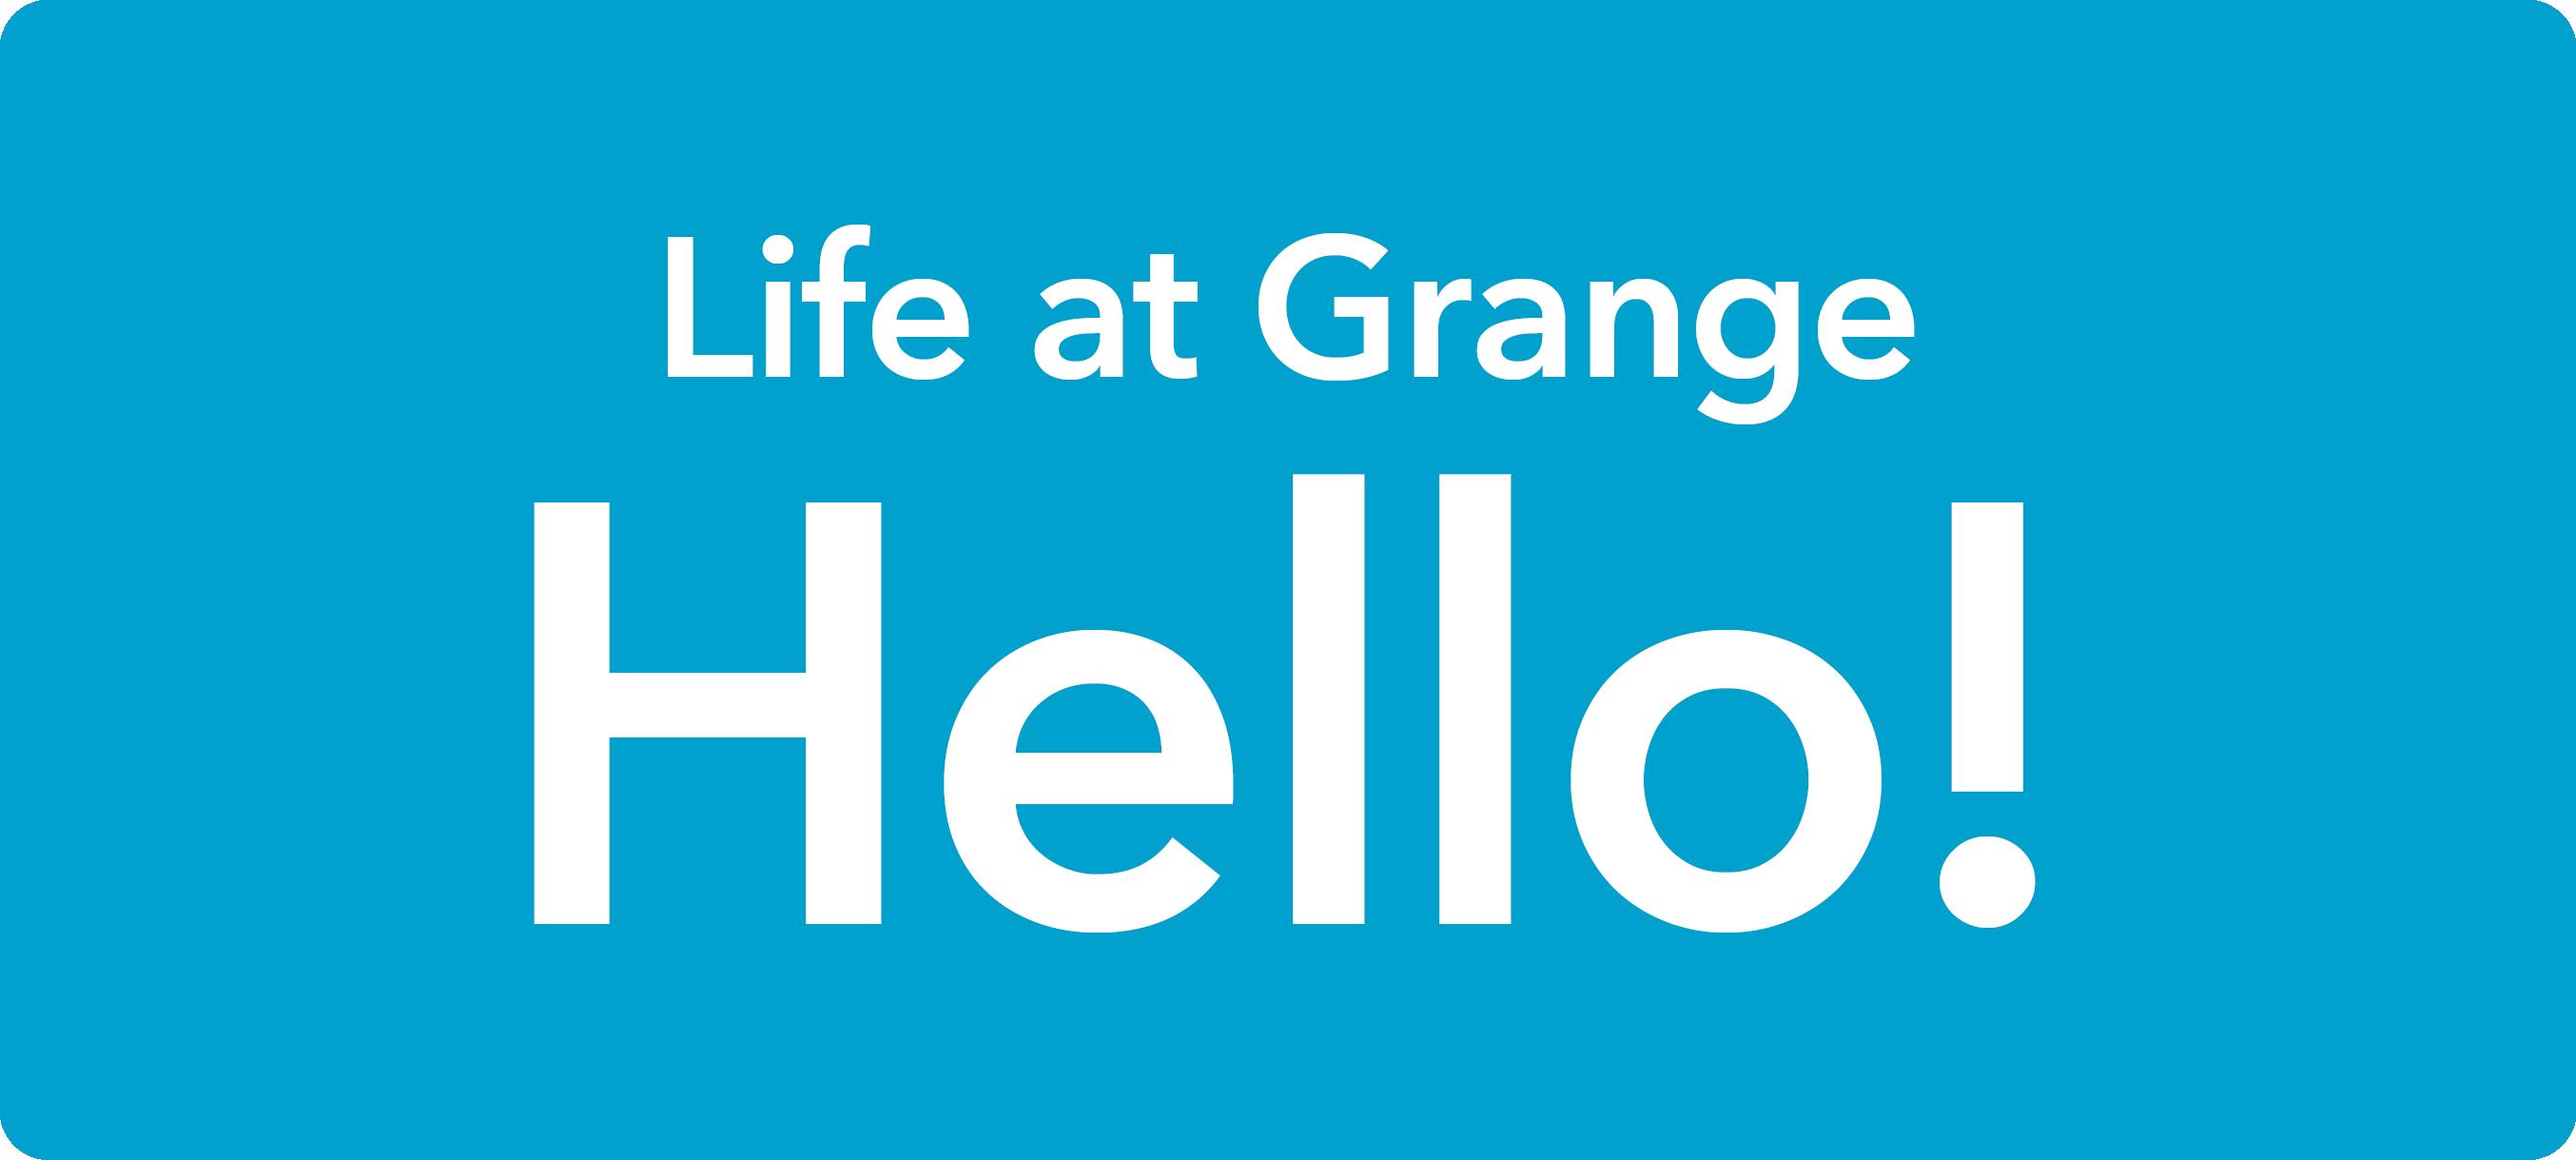 Life at Grange